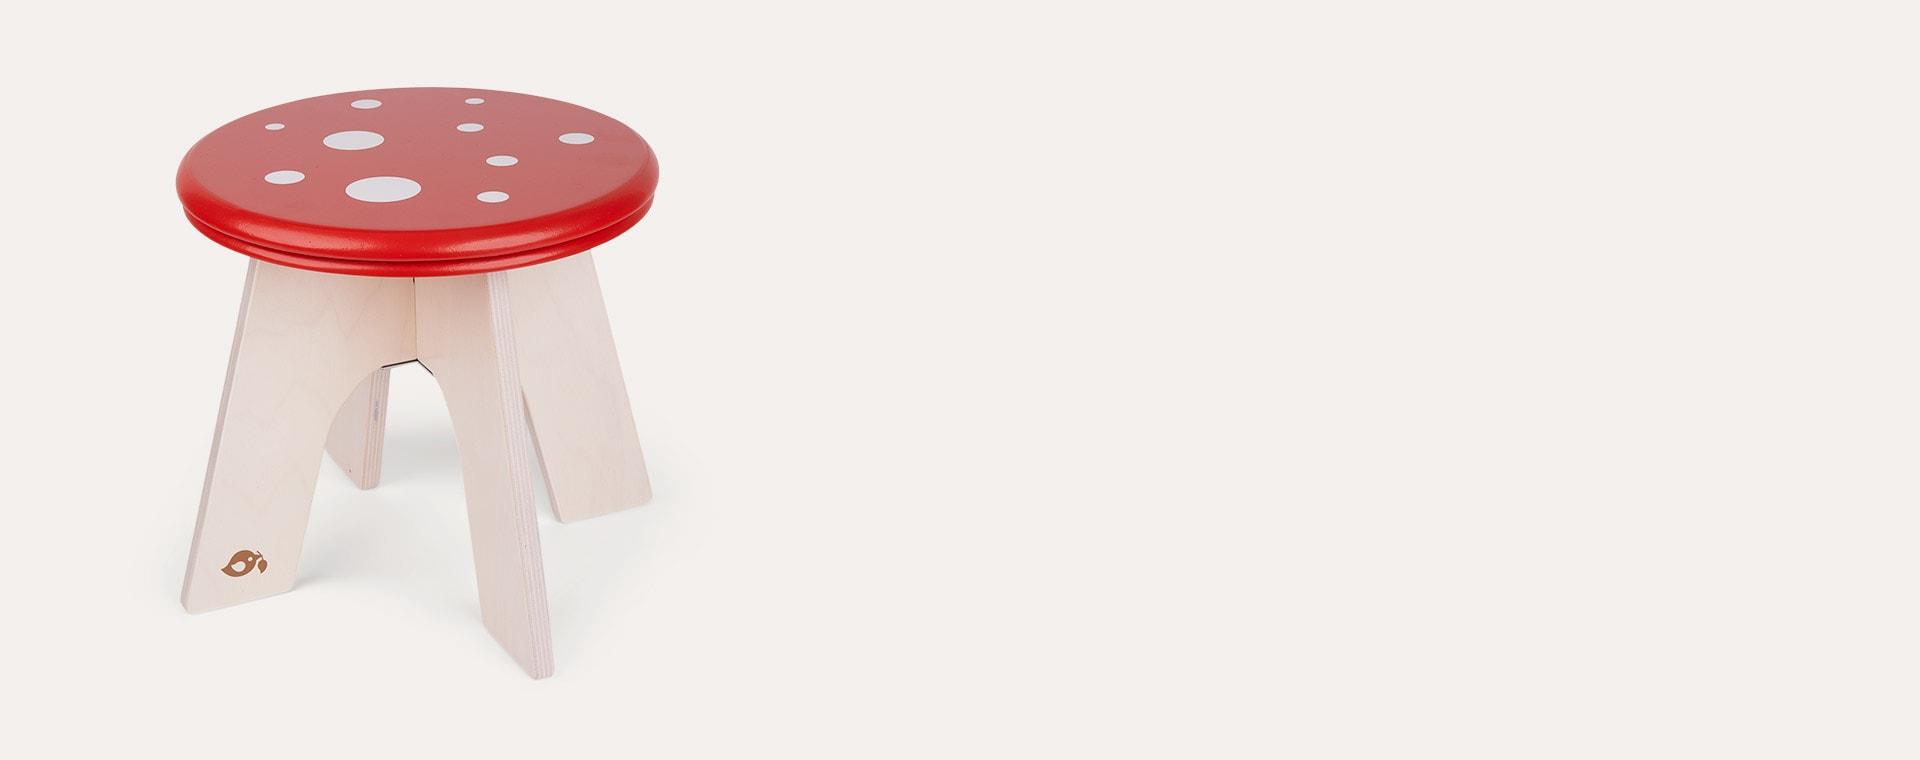 Red Tender Leaf Toys Toadstool